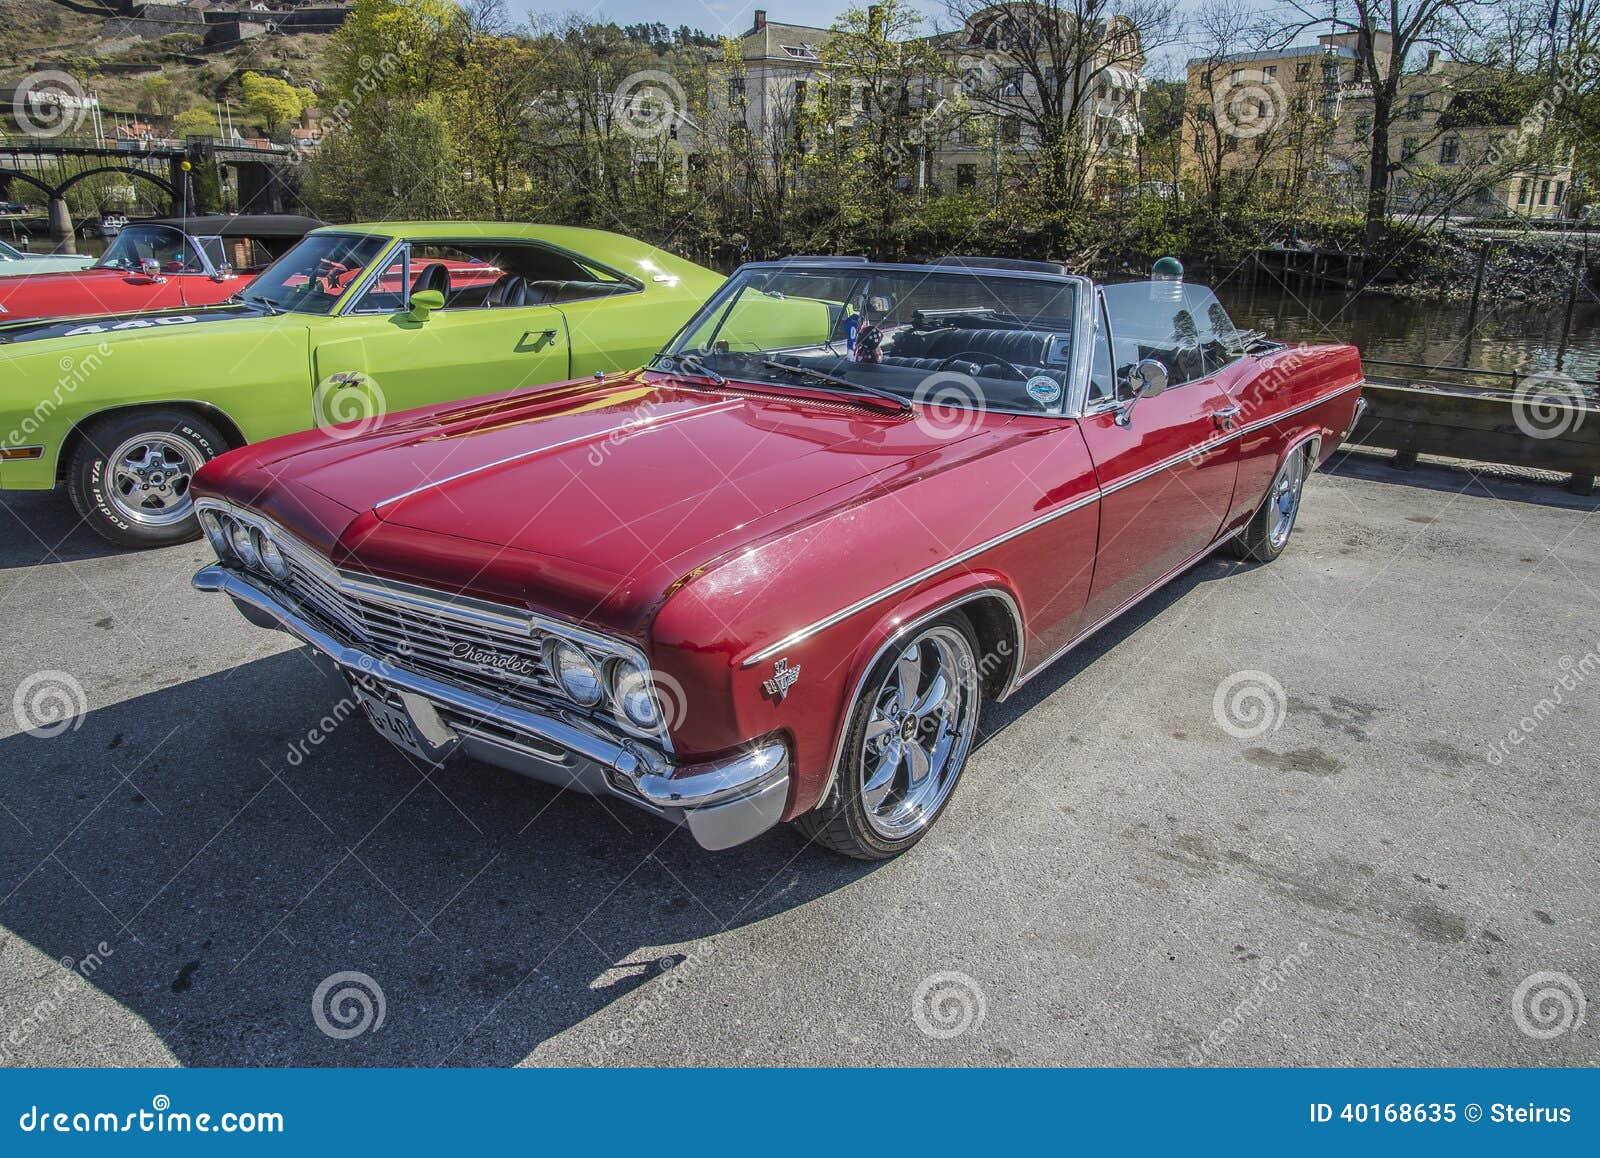 Convertible 1966 Superbe Du Sport 2 Door De Chevrolet Impala Image Chevy